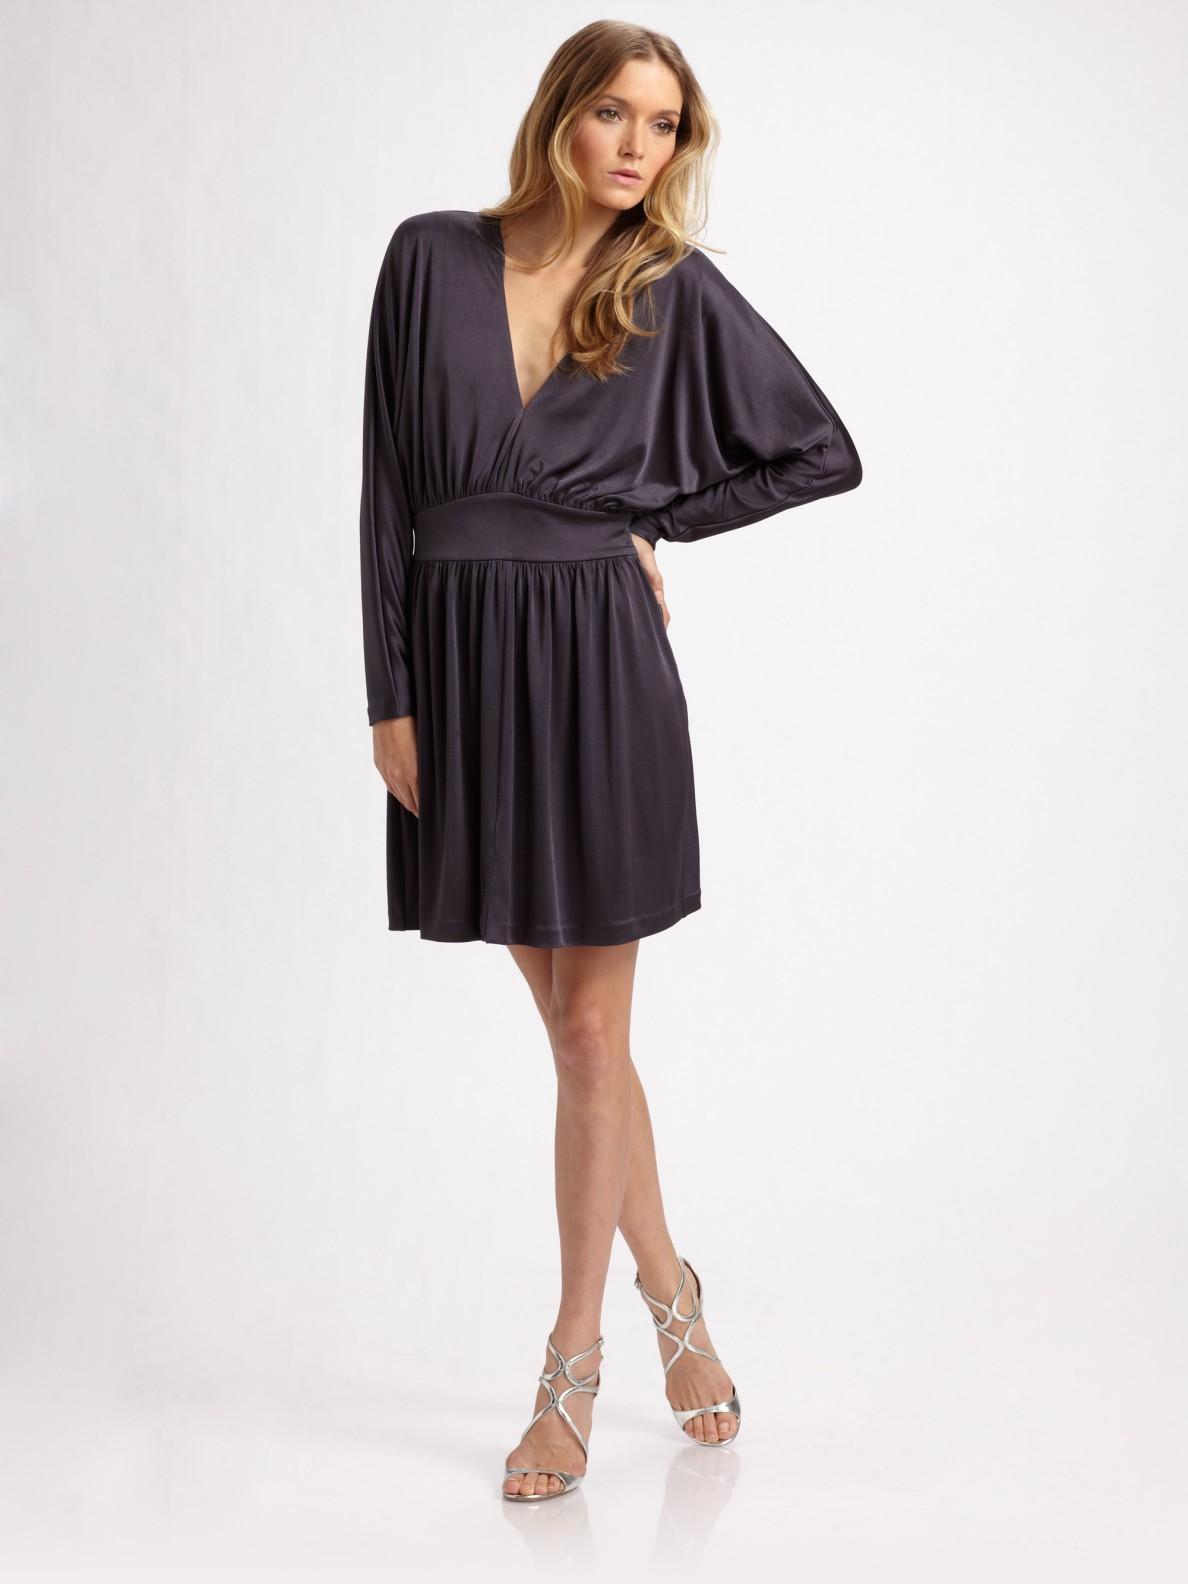 181ae8dd828 Deep V-Neck Cocktail Dresses – Fashion dresses